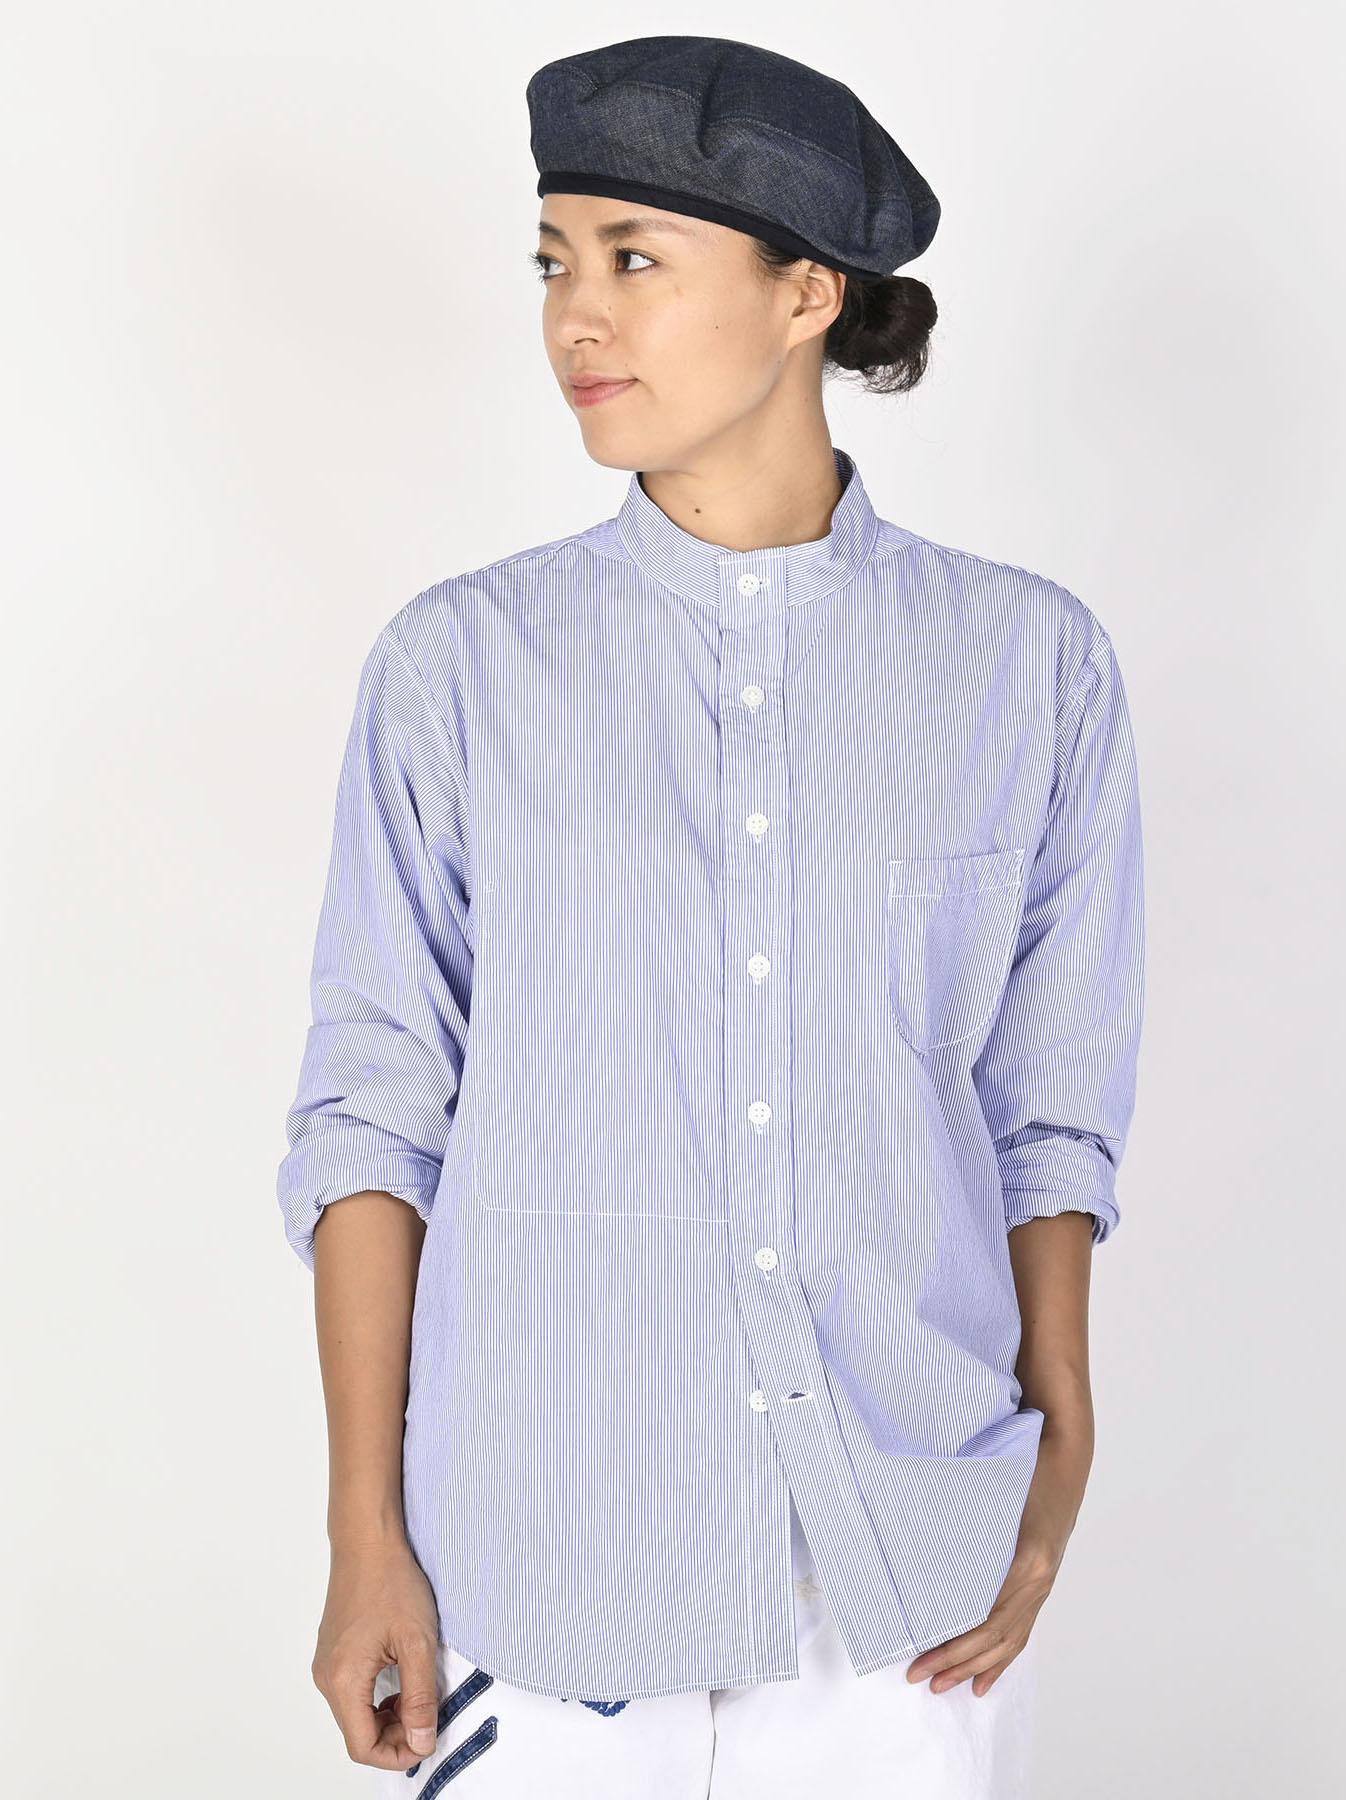 Miko Stand Collar 908 Ocean Shirt-4